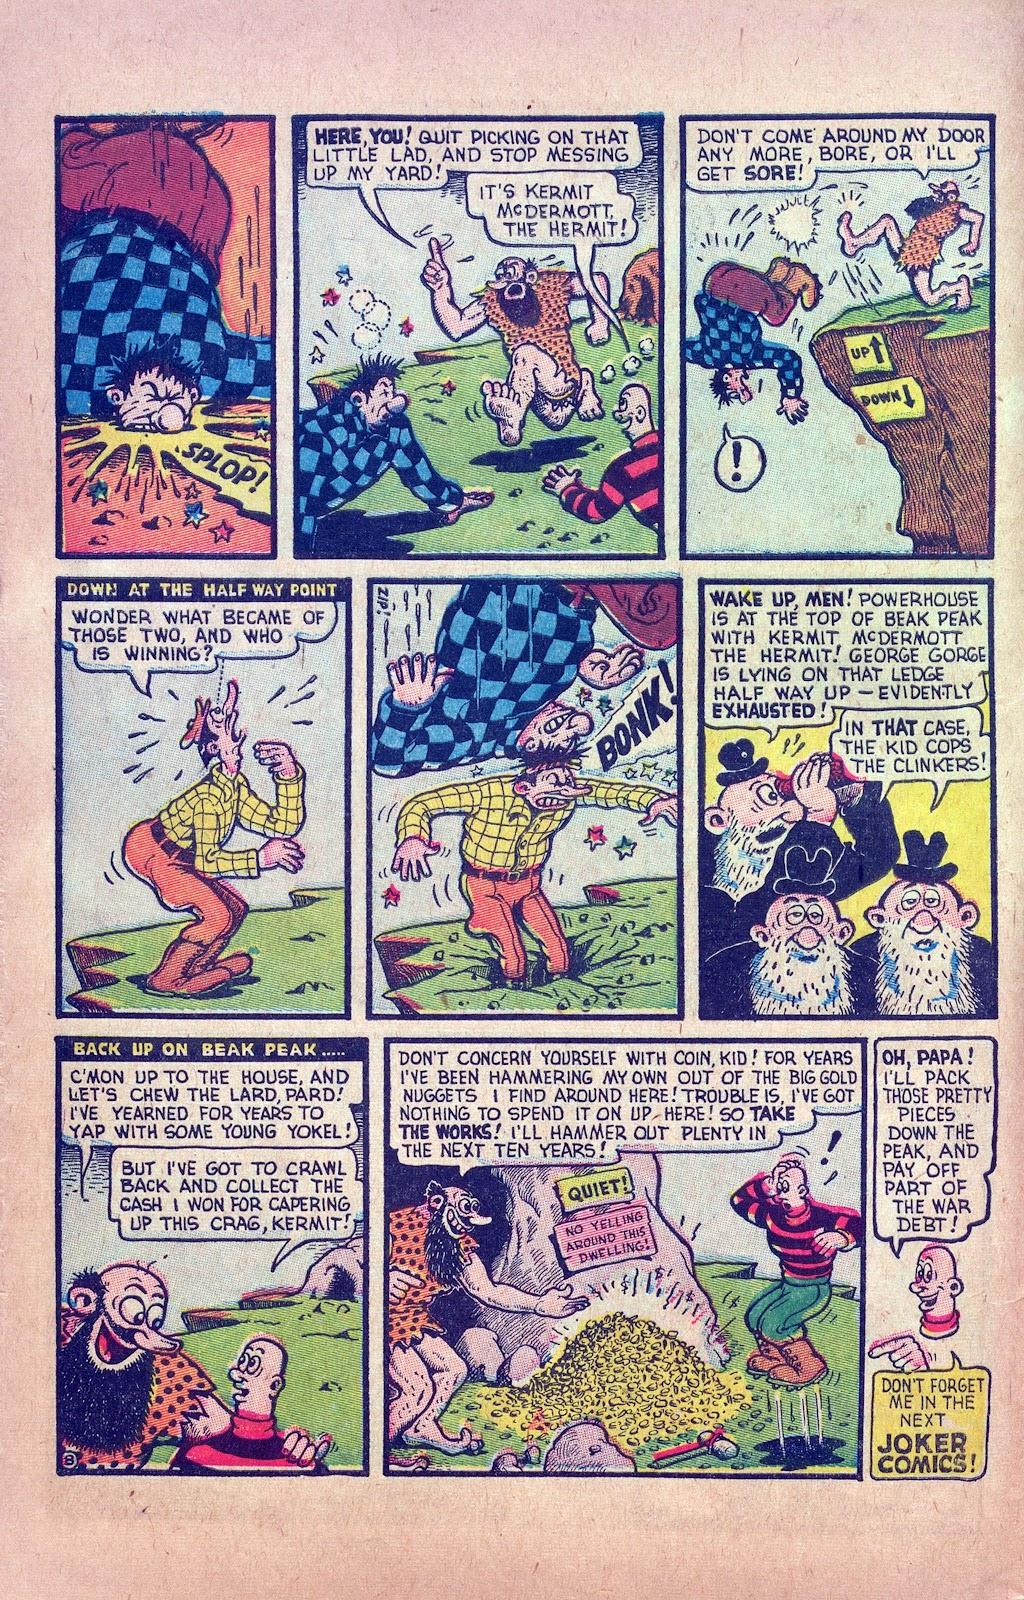 Read online Joker Comics comic -  Issue #16 - 16